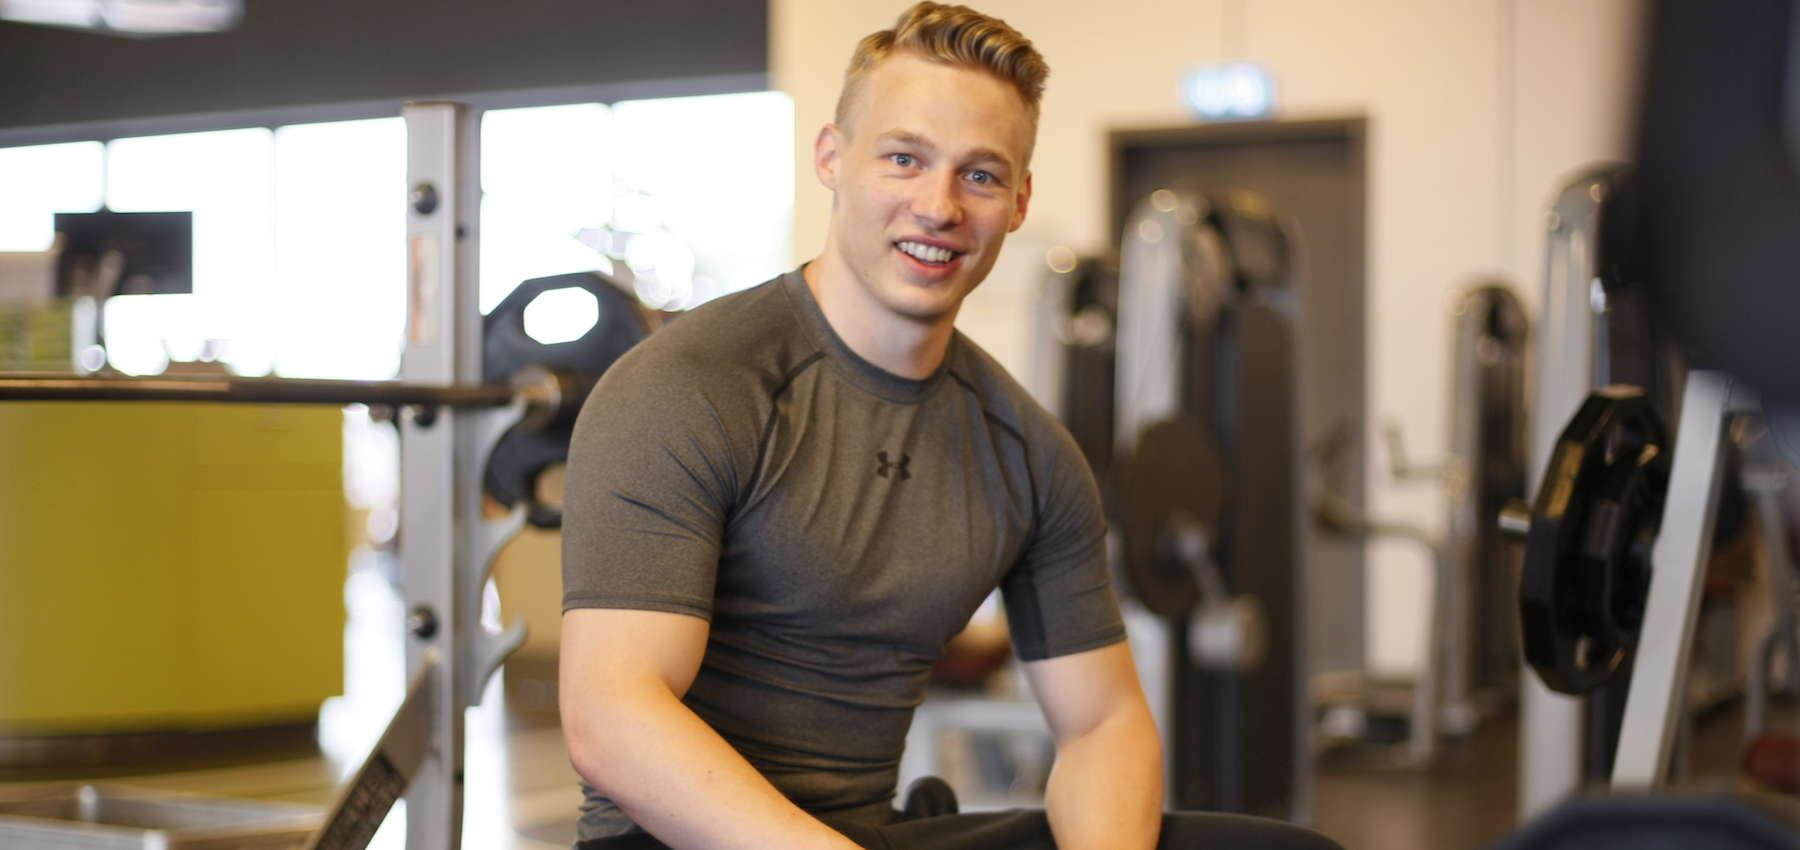 Personal Trainer Jannik Schoening Slider gross